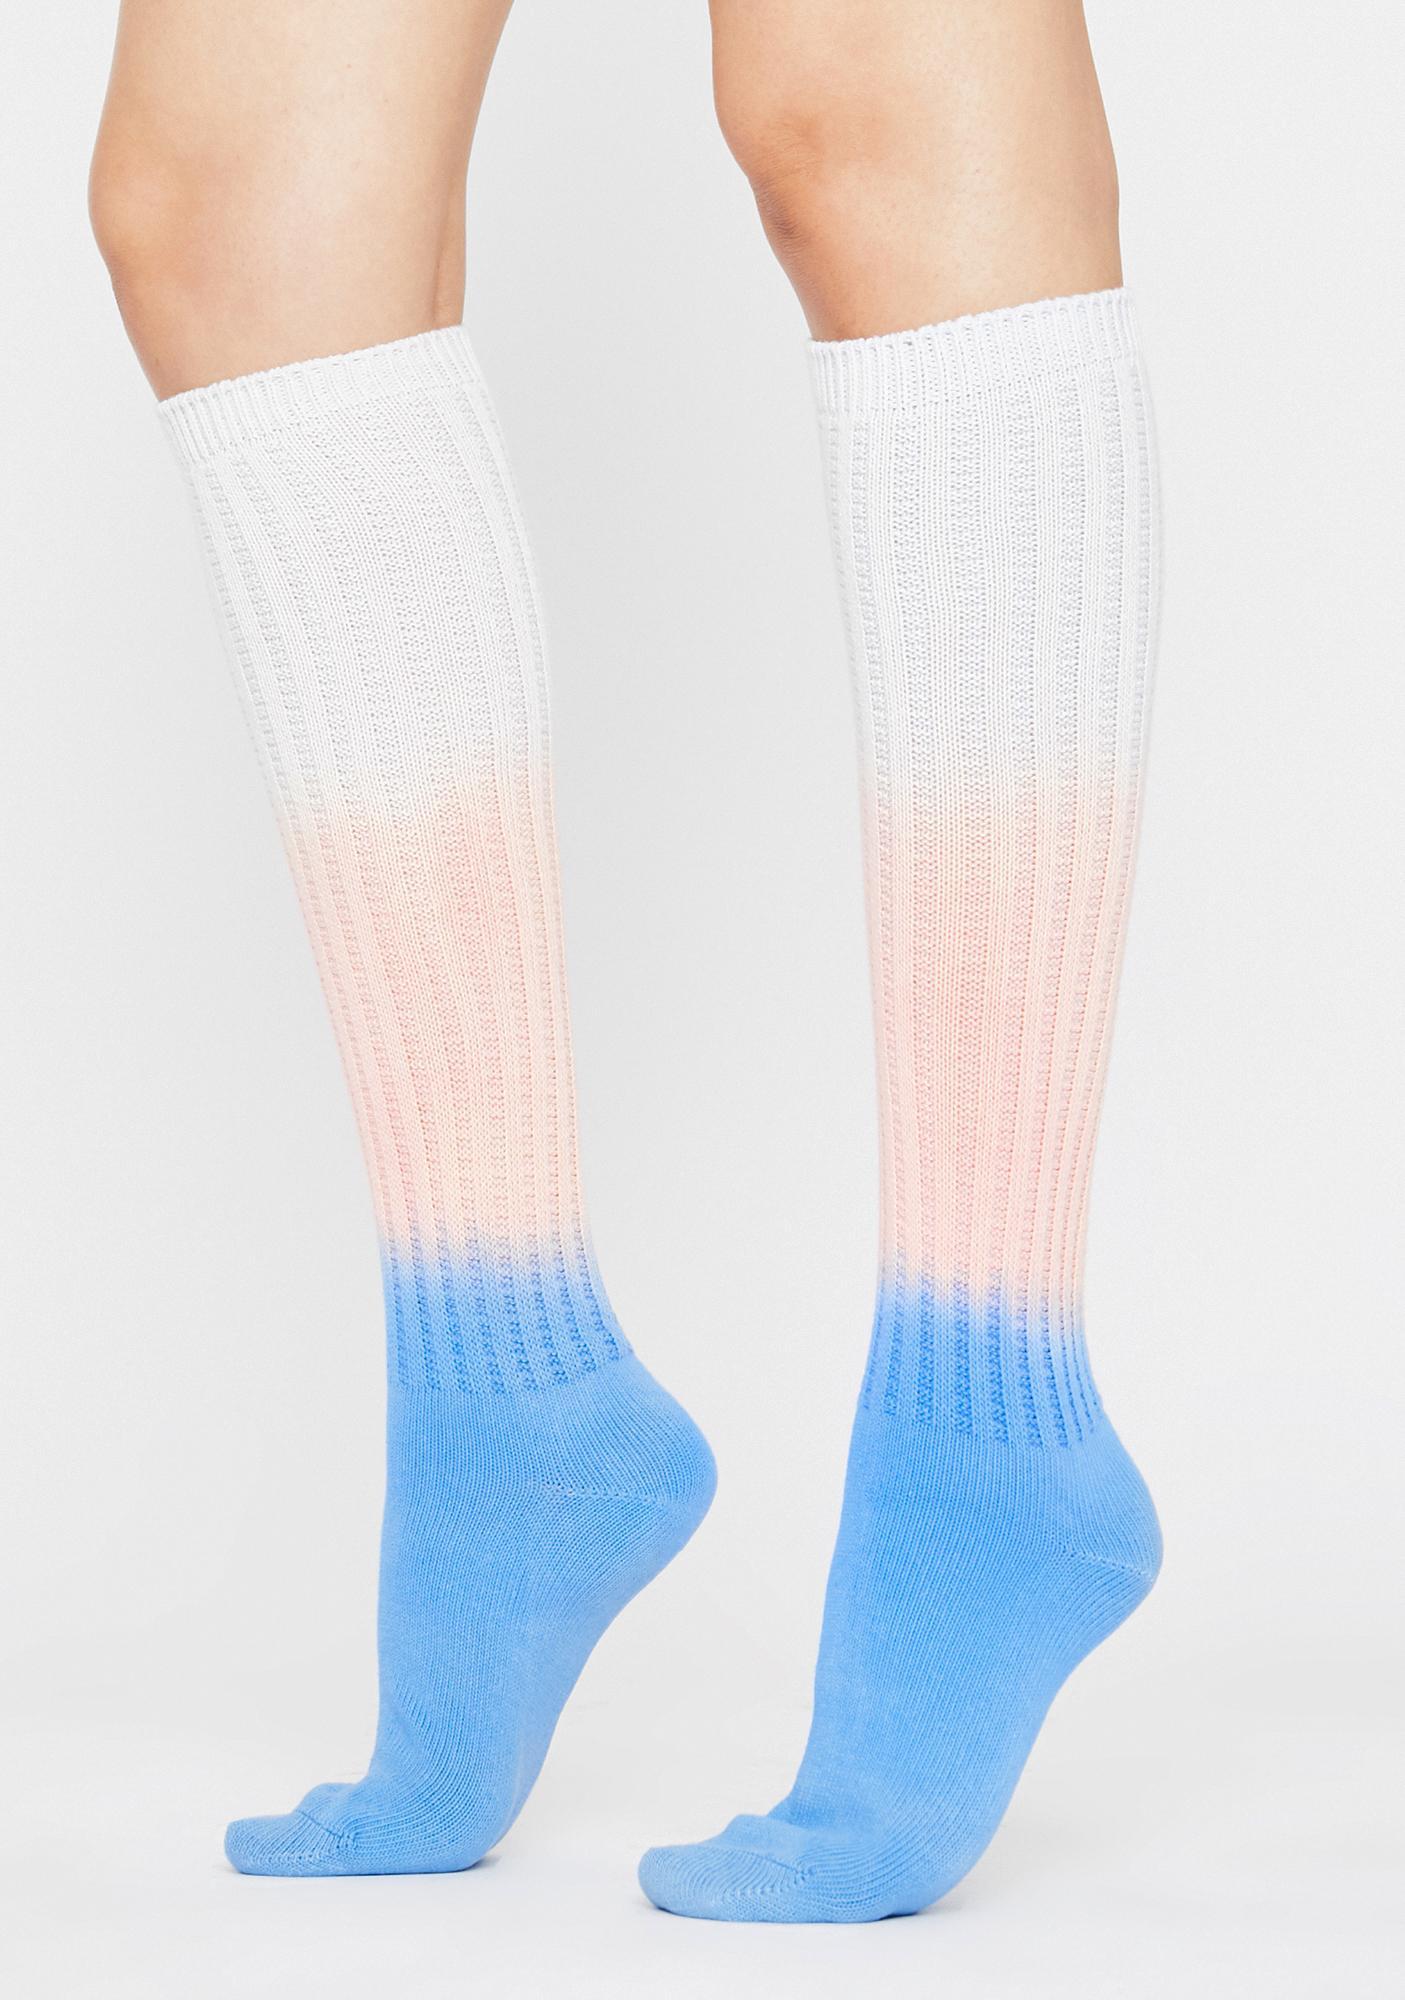 Sugar Dose Knee High Socks